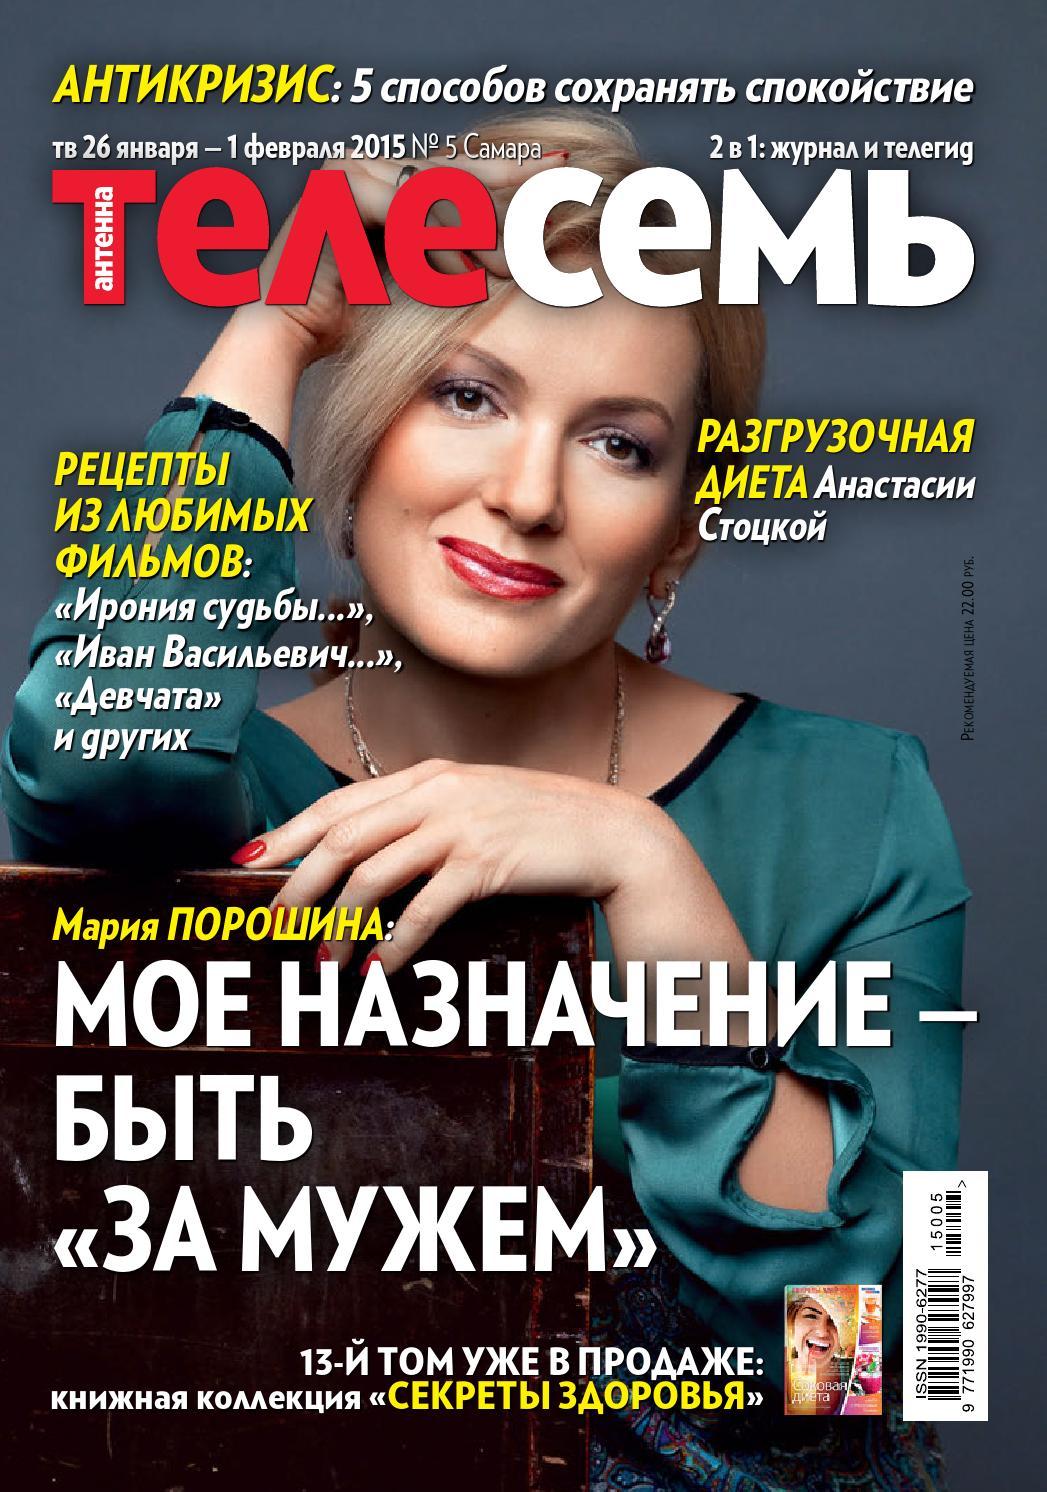 Ксения Теплова Засветила Попу В Колготках – Анжелика (2014) (2014)